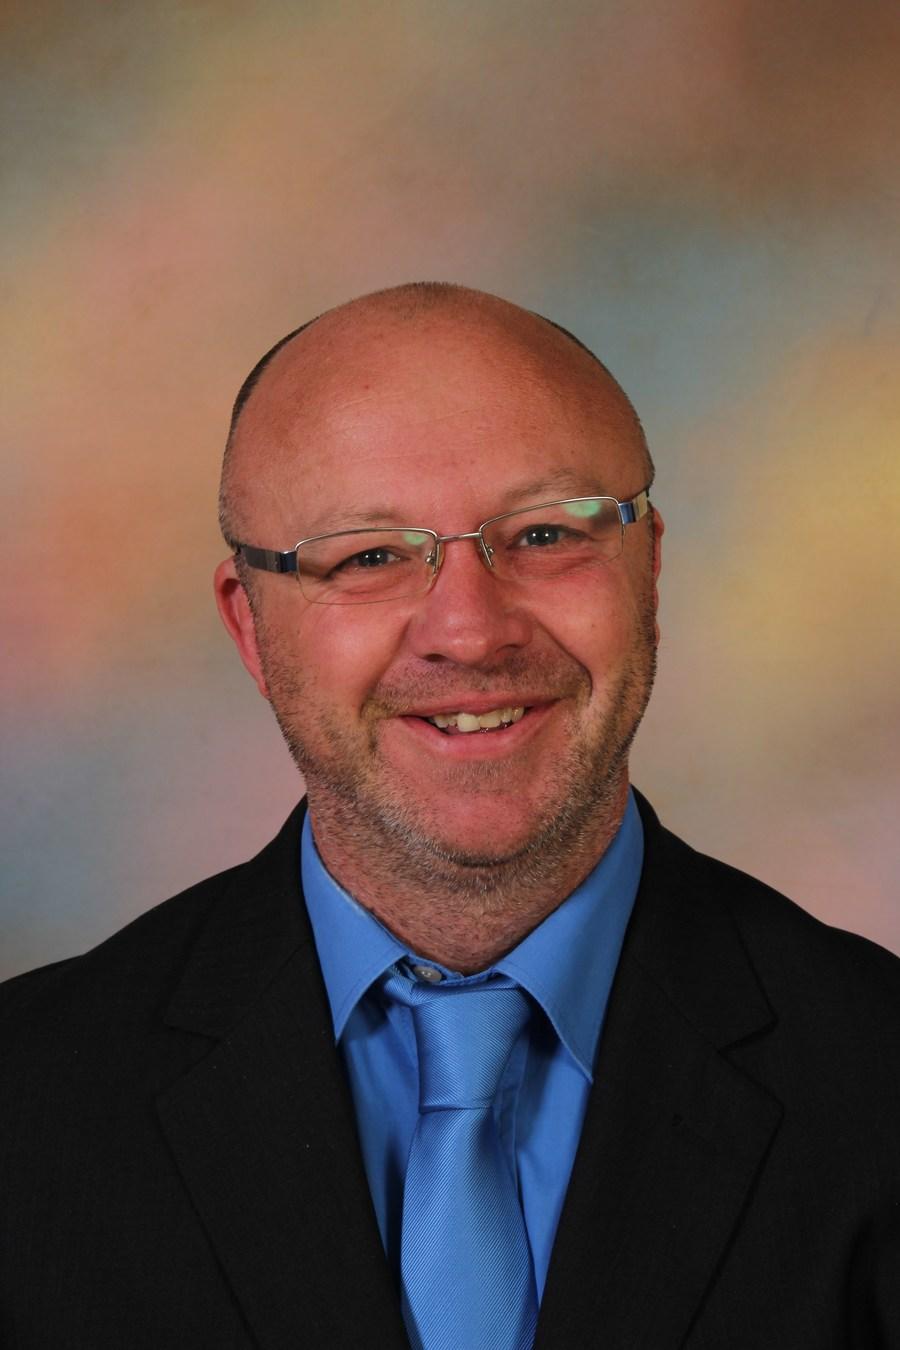 Mr P Broadstock - Assistant Headteacher